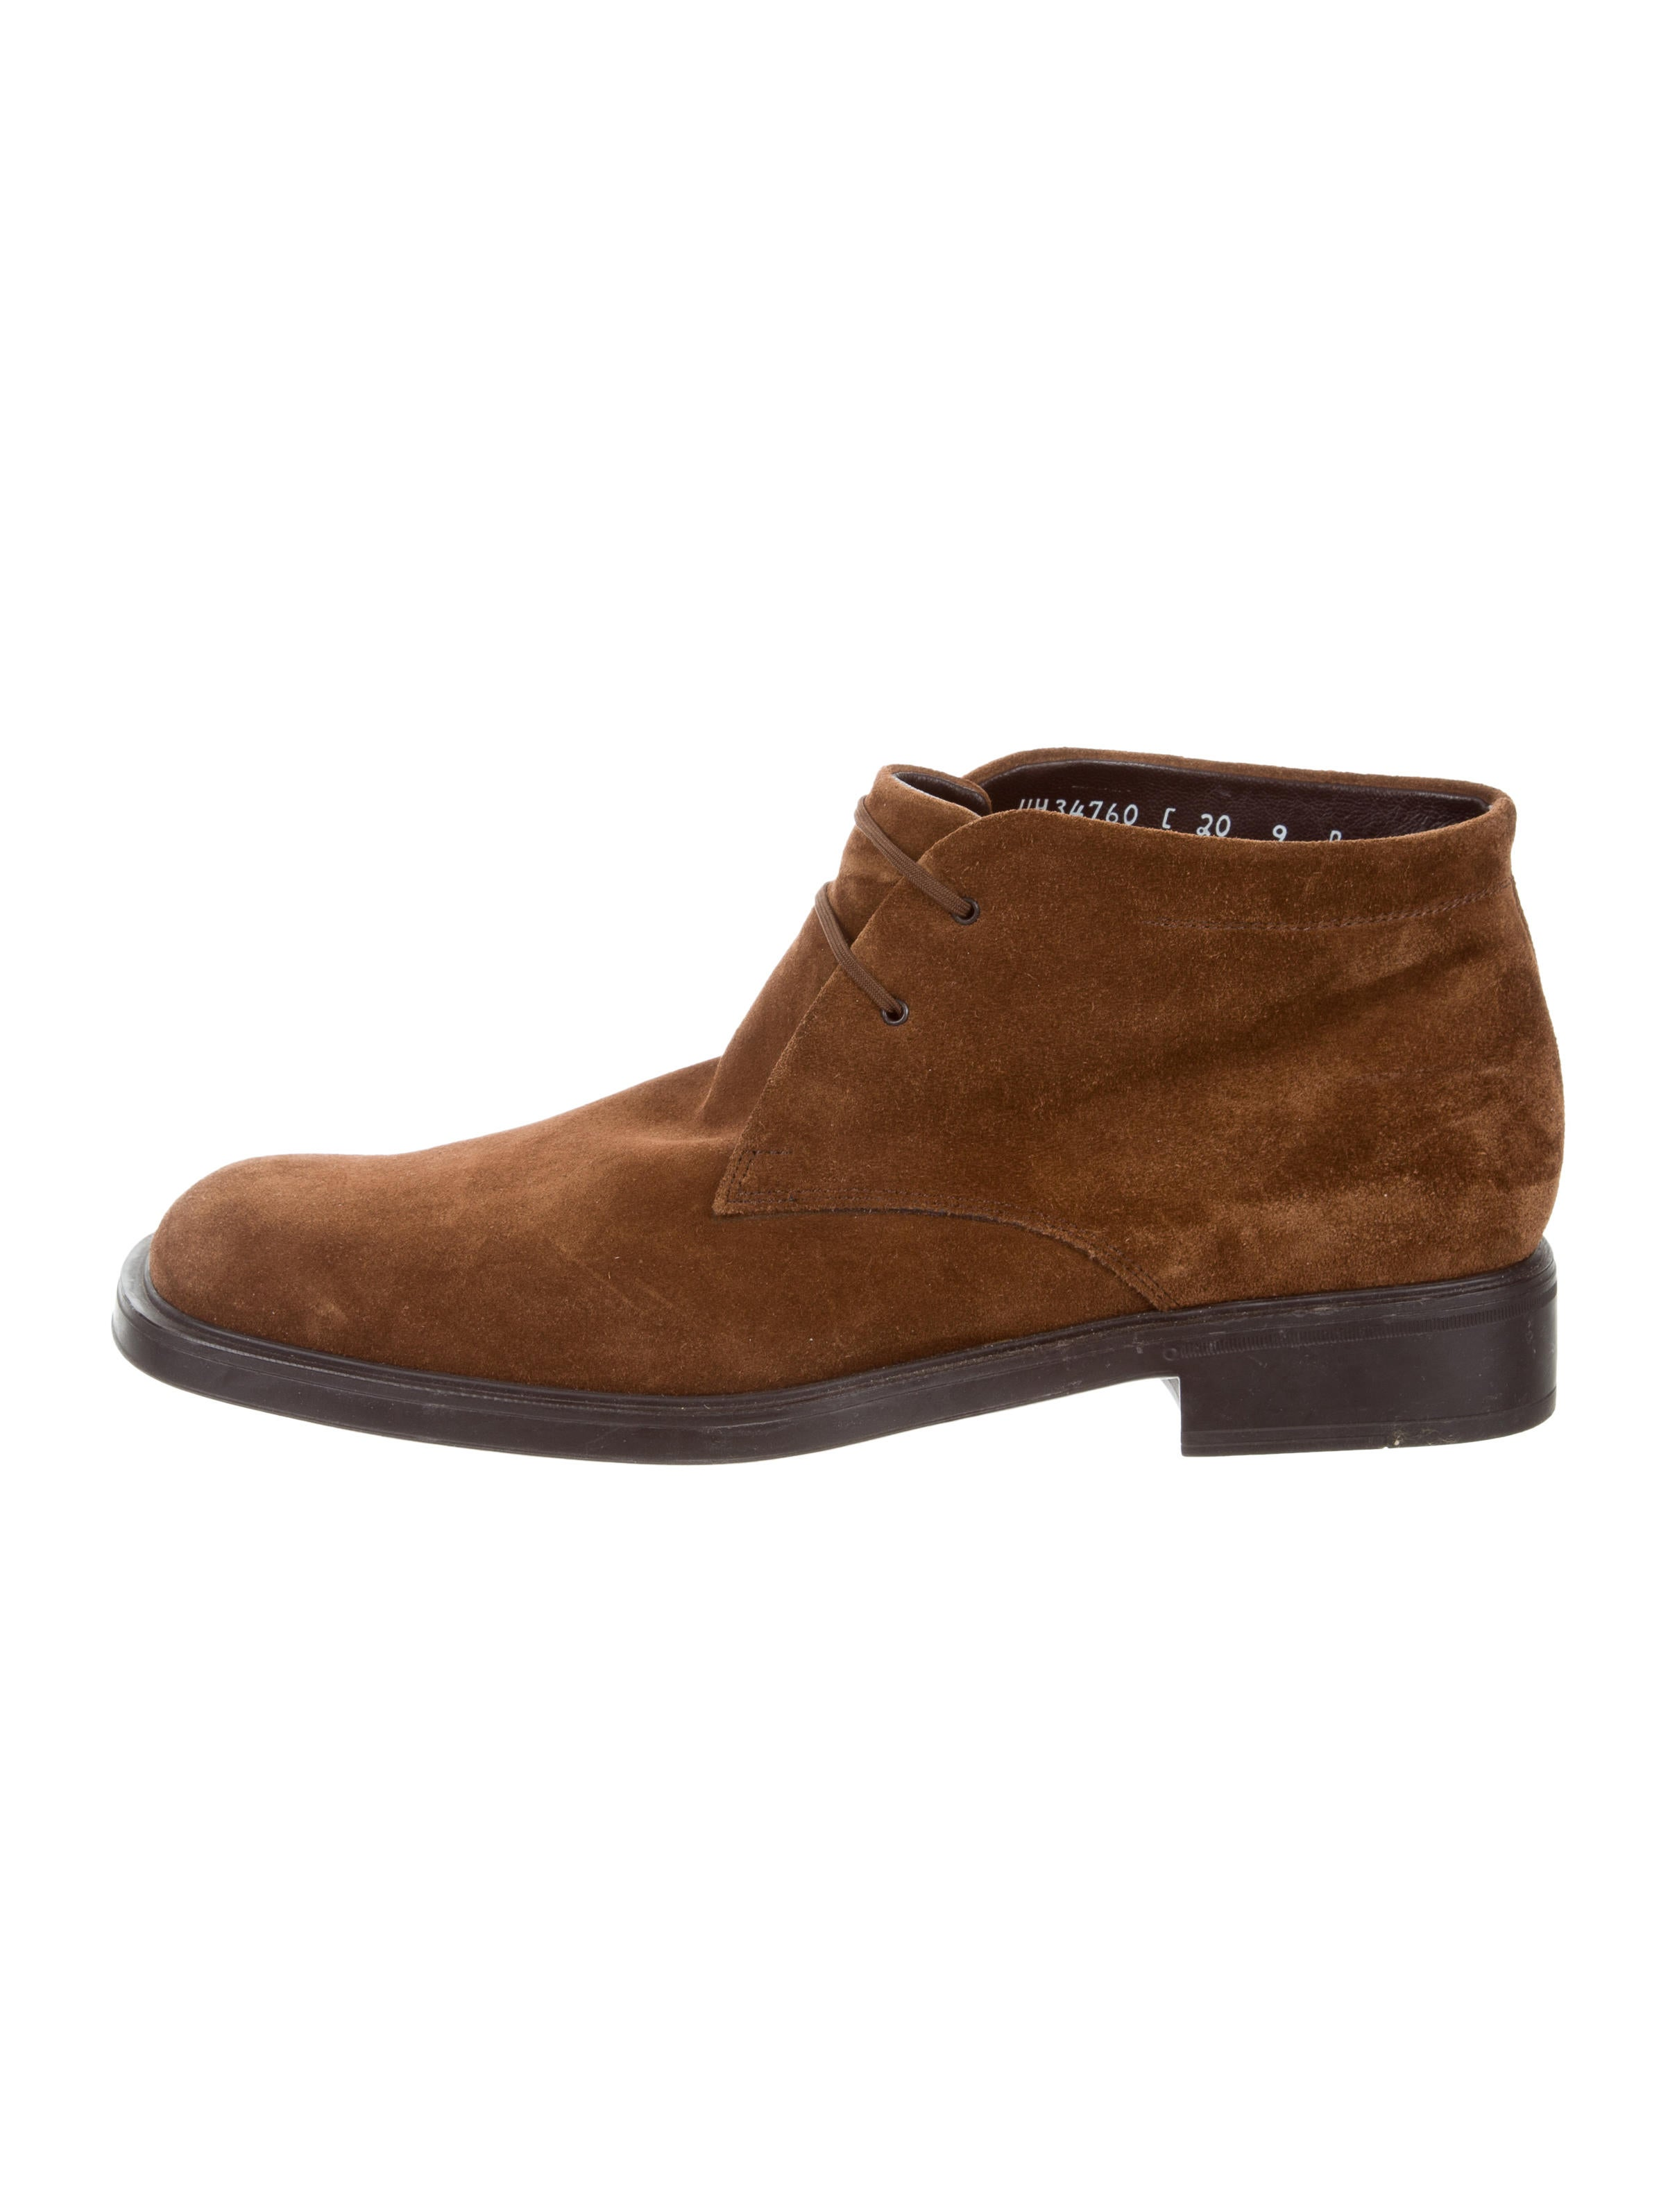 salvatore ferragamo suede desert boots shoes sal54126